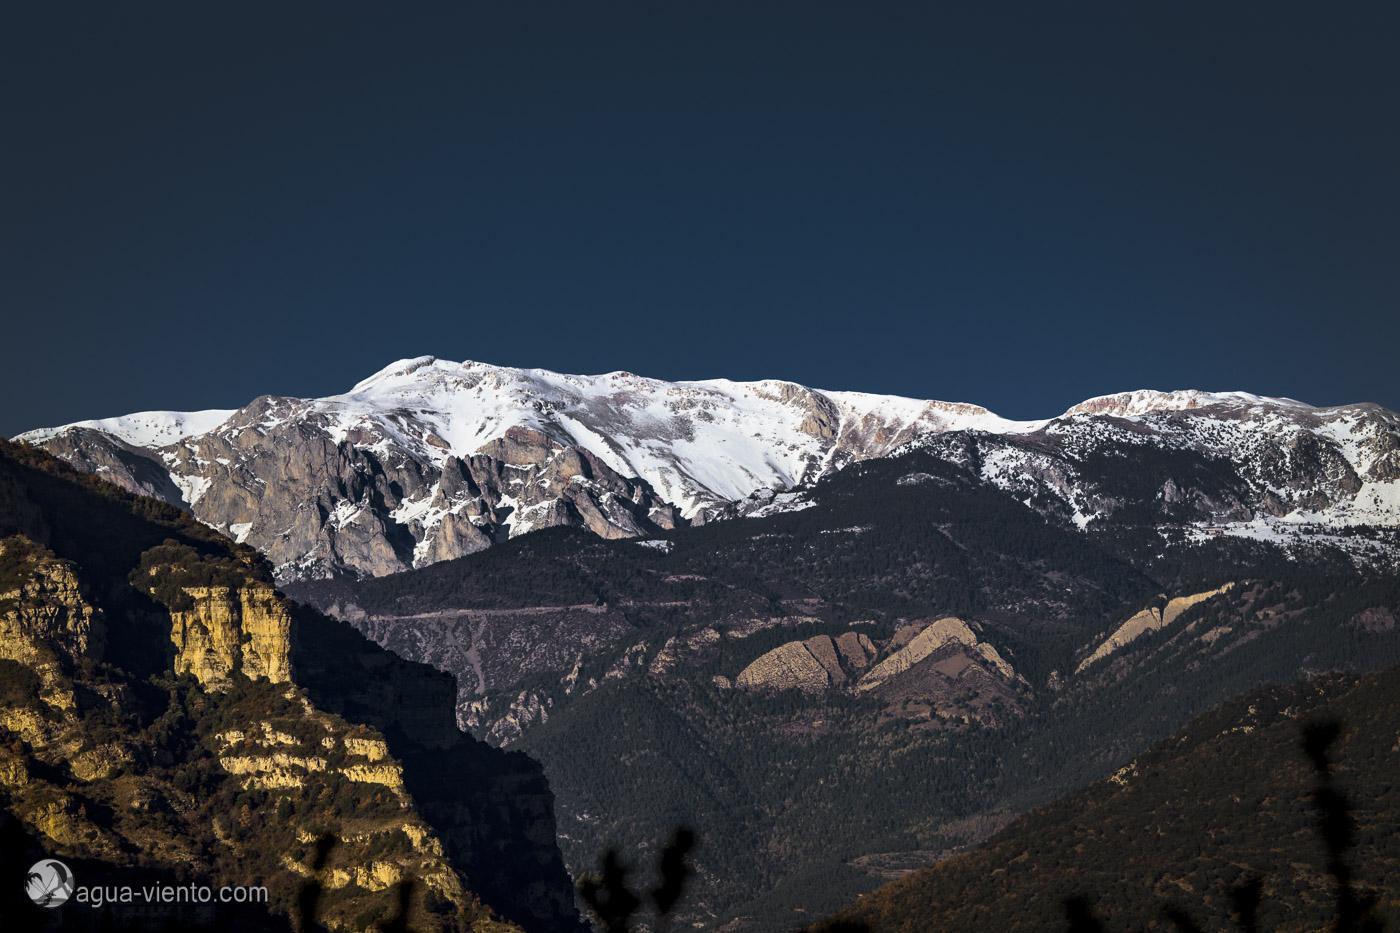 Spanien Pyrenäen Serra del Cadì-Moixeró Wandern Katalonien